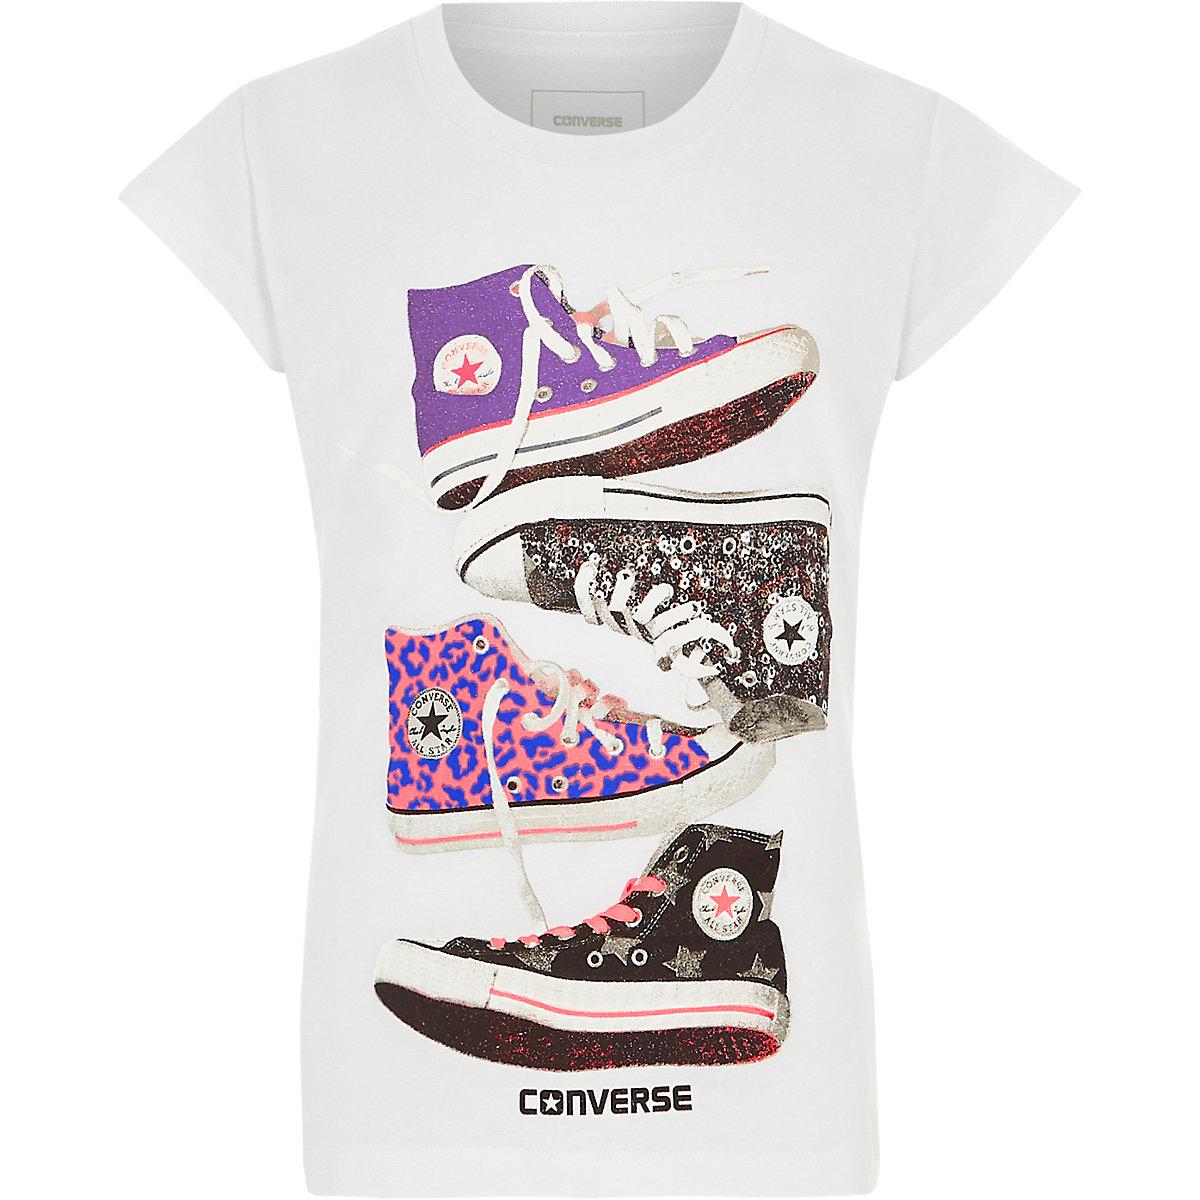 Girls Converse white sneakers print T-shirt